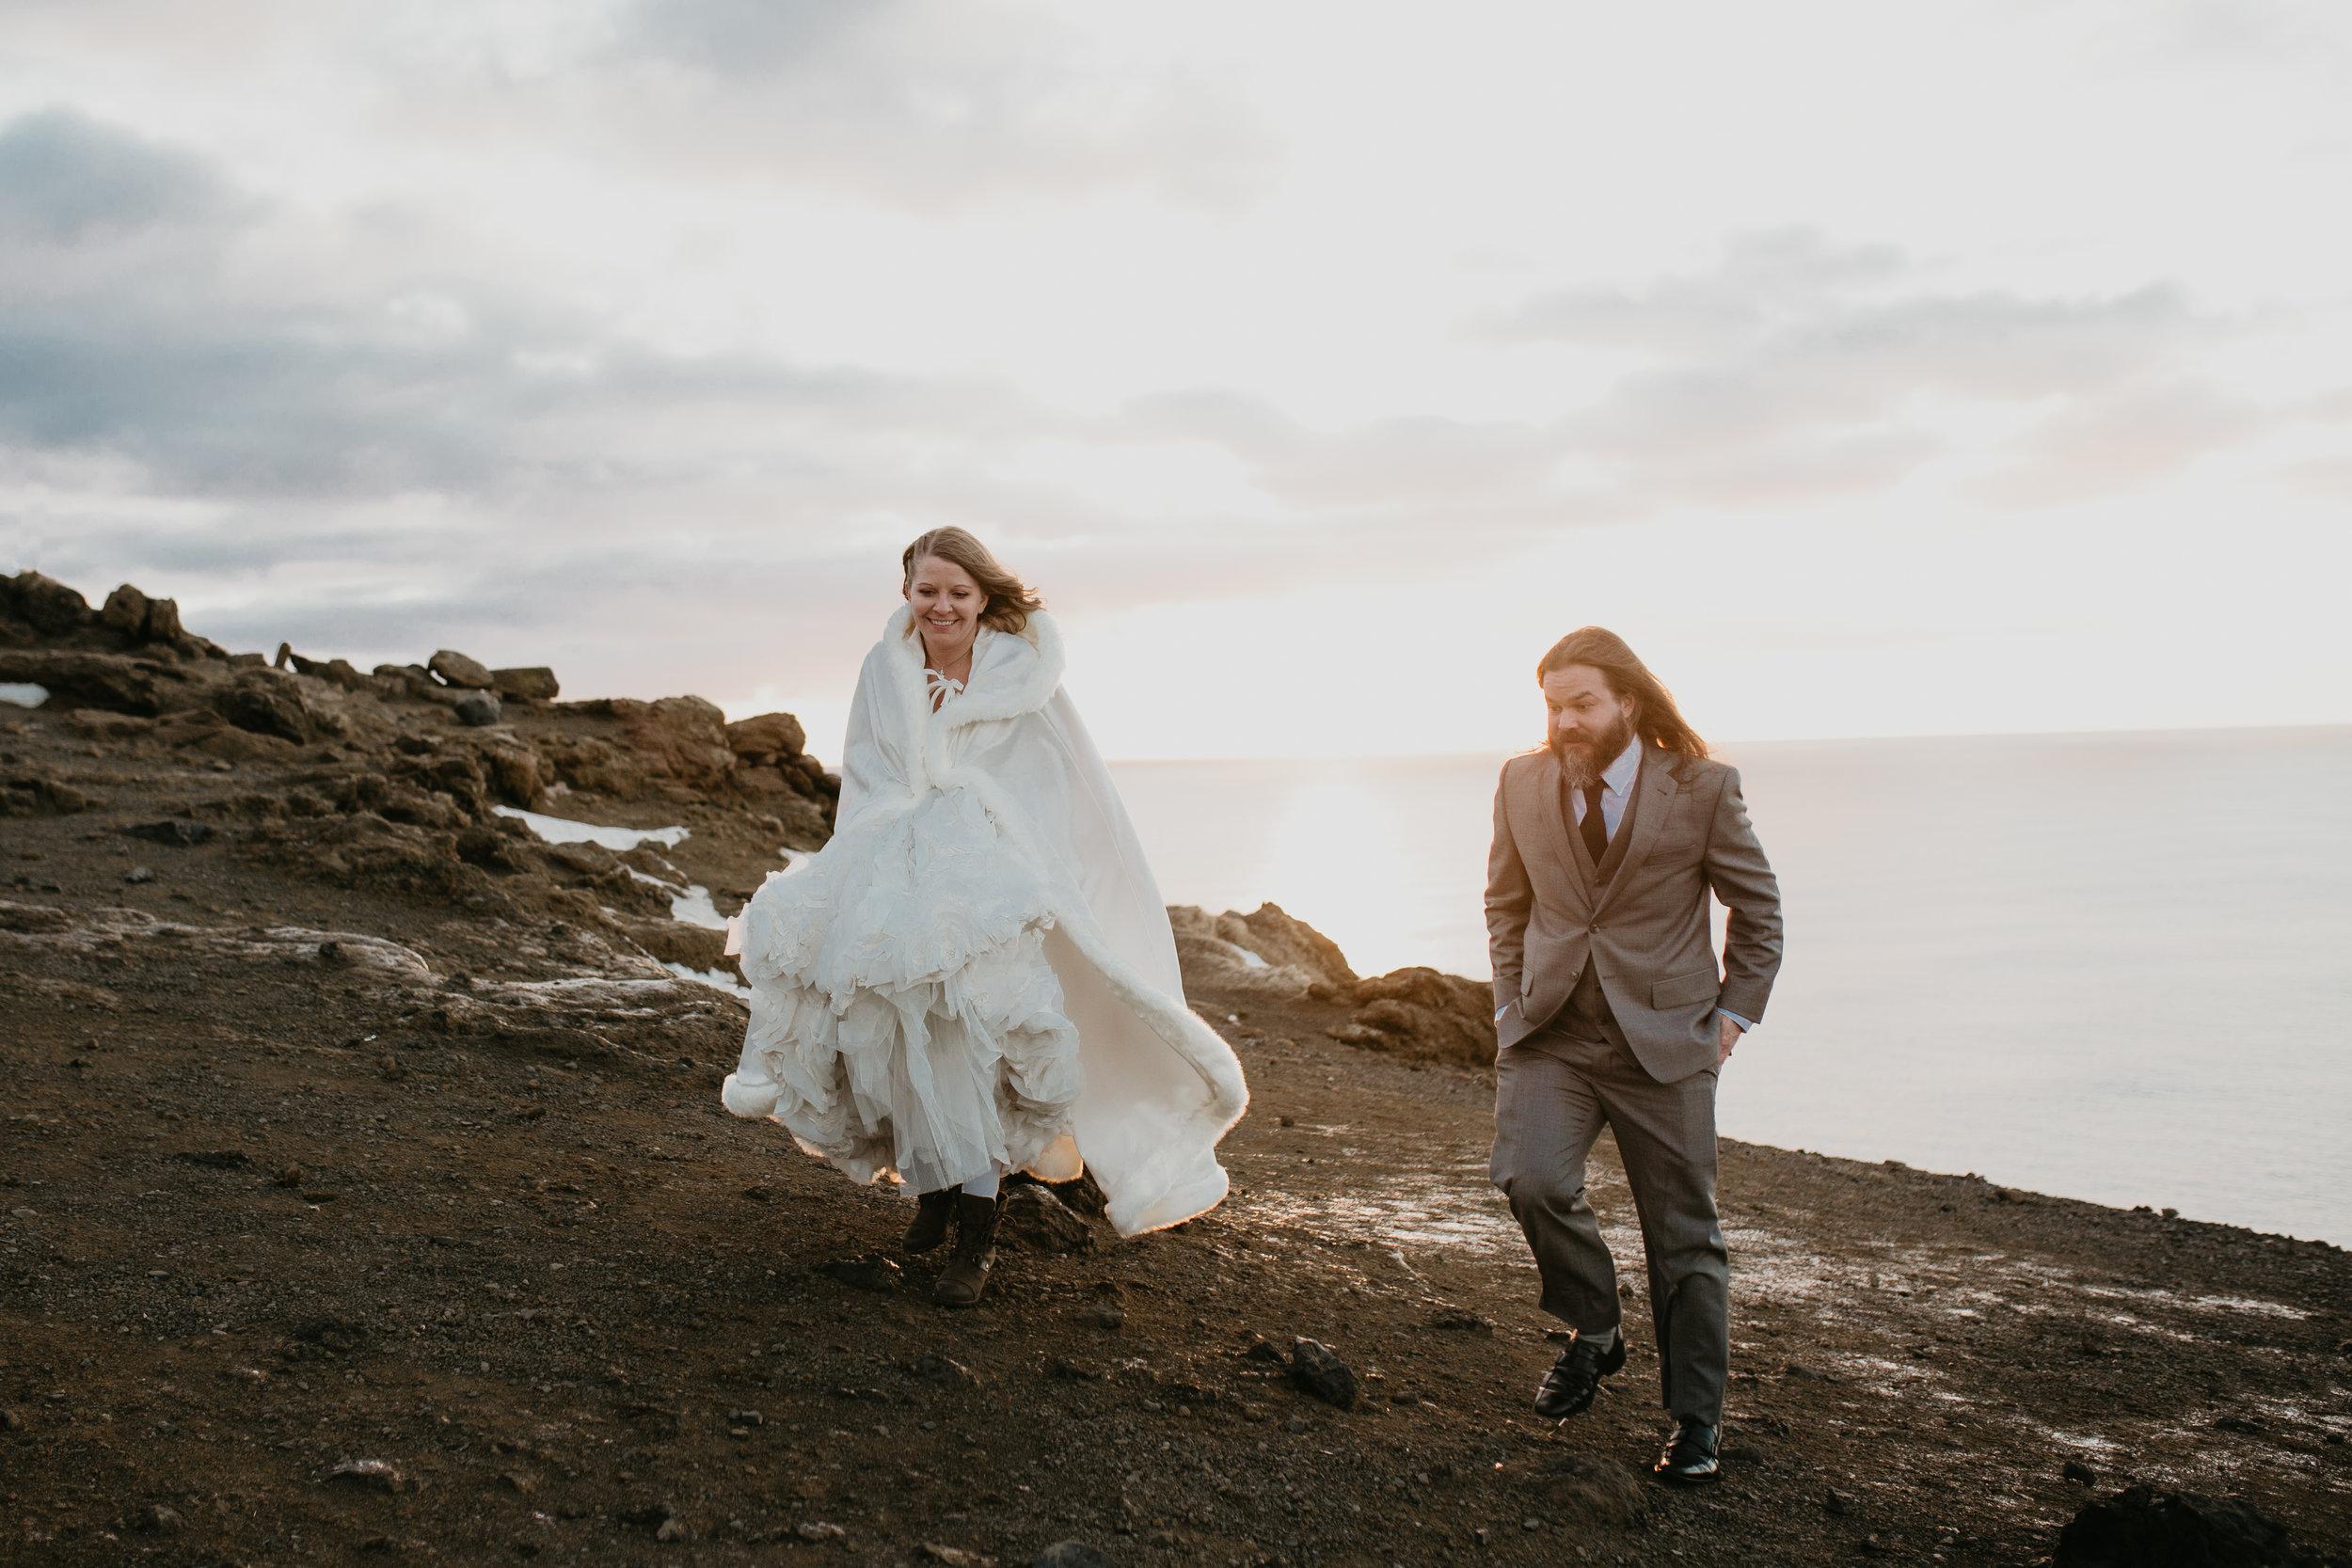 nicole-daacke-photography-iceland-winter-sunset-adventure-elopement-skogafoss-waterfall-black-sand-beach-dyrholaey-vik-iceland-intimate-wedding-black-church-elopement-photographer-45.jpg